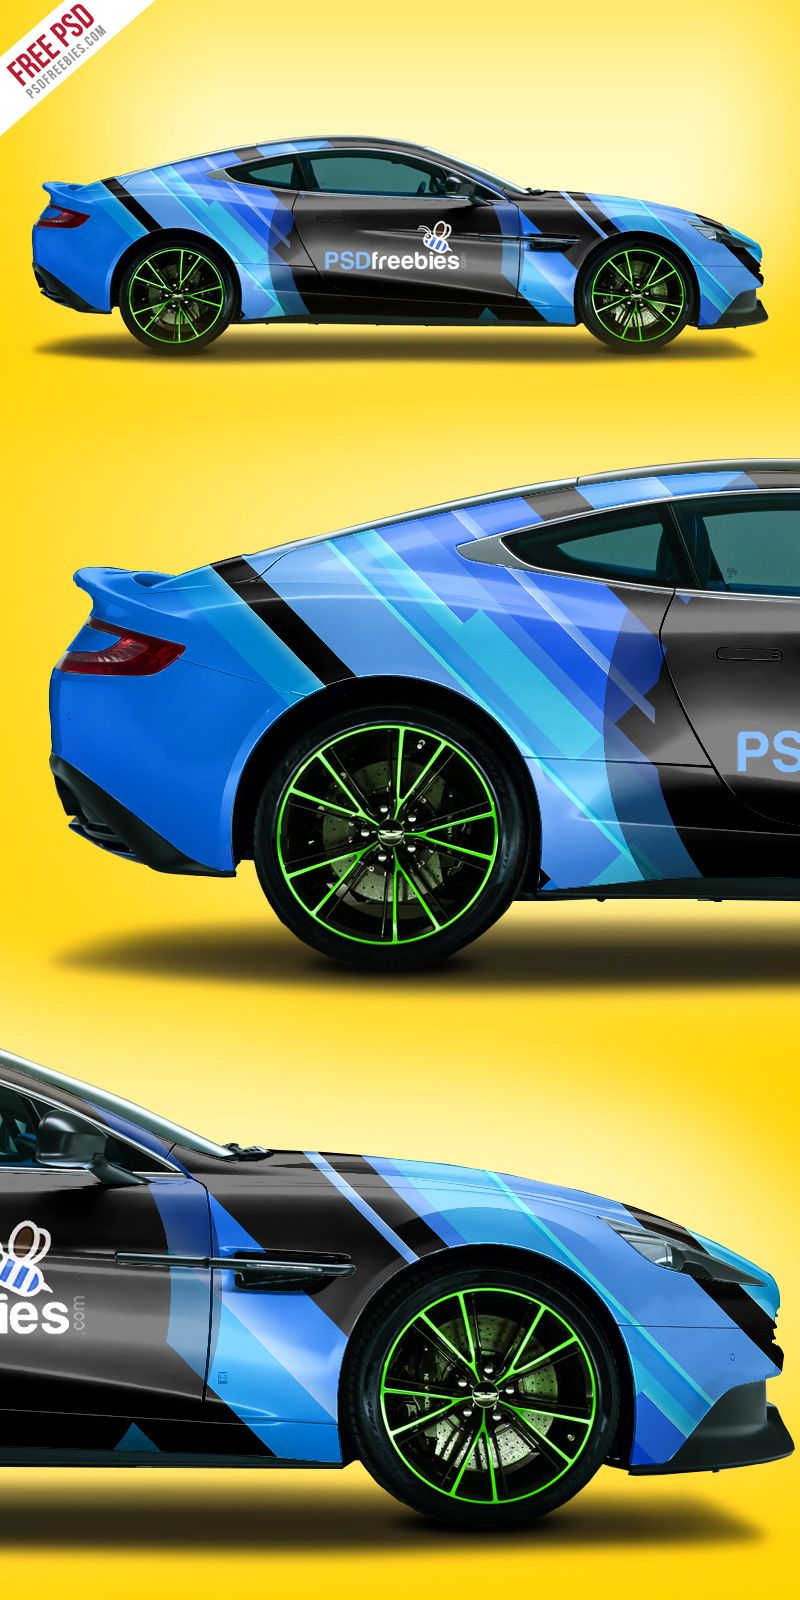 Aston Martin Car Branding Mockup Free PSD Car, Aston